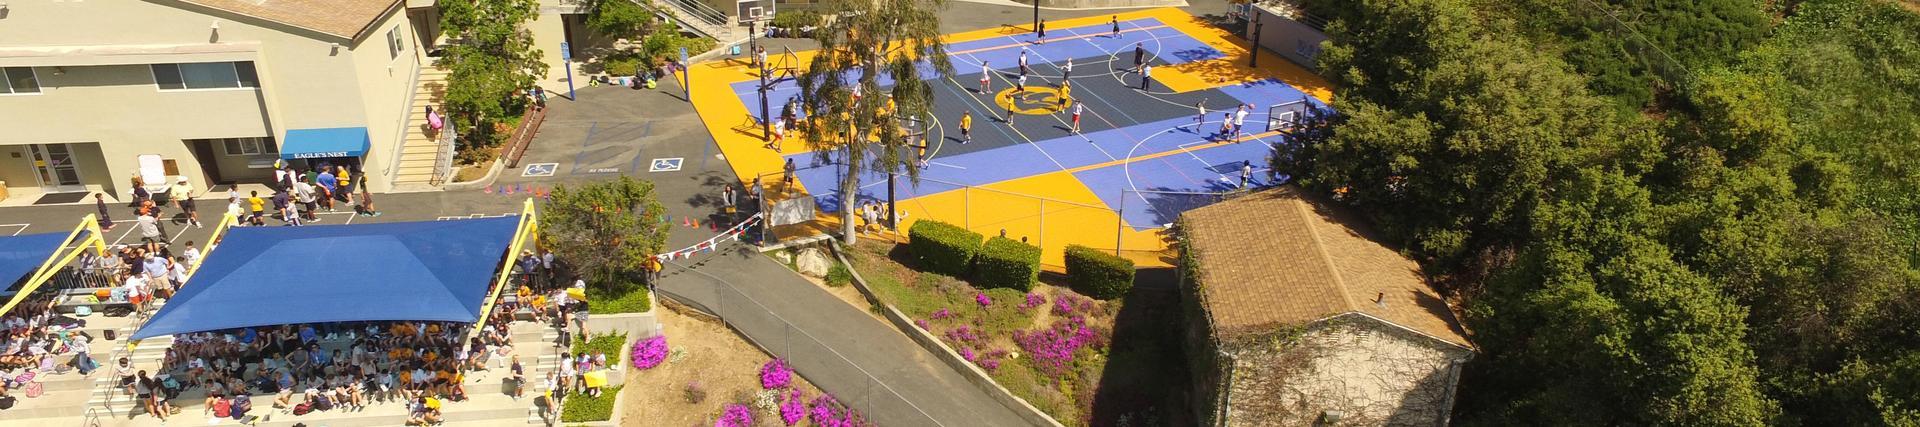 High Point campus